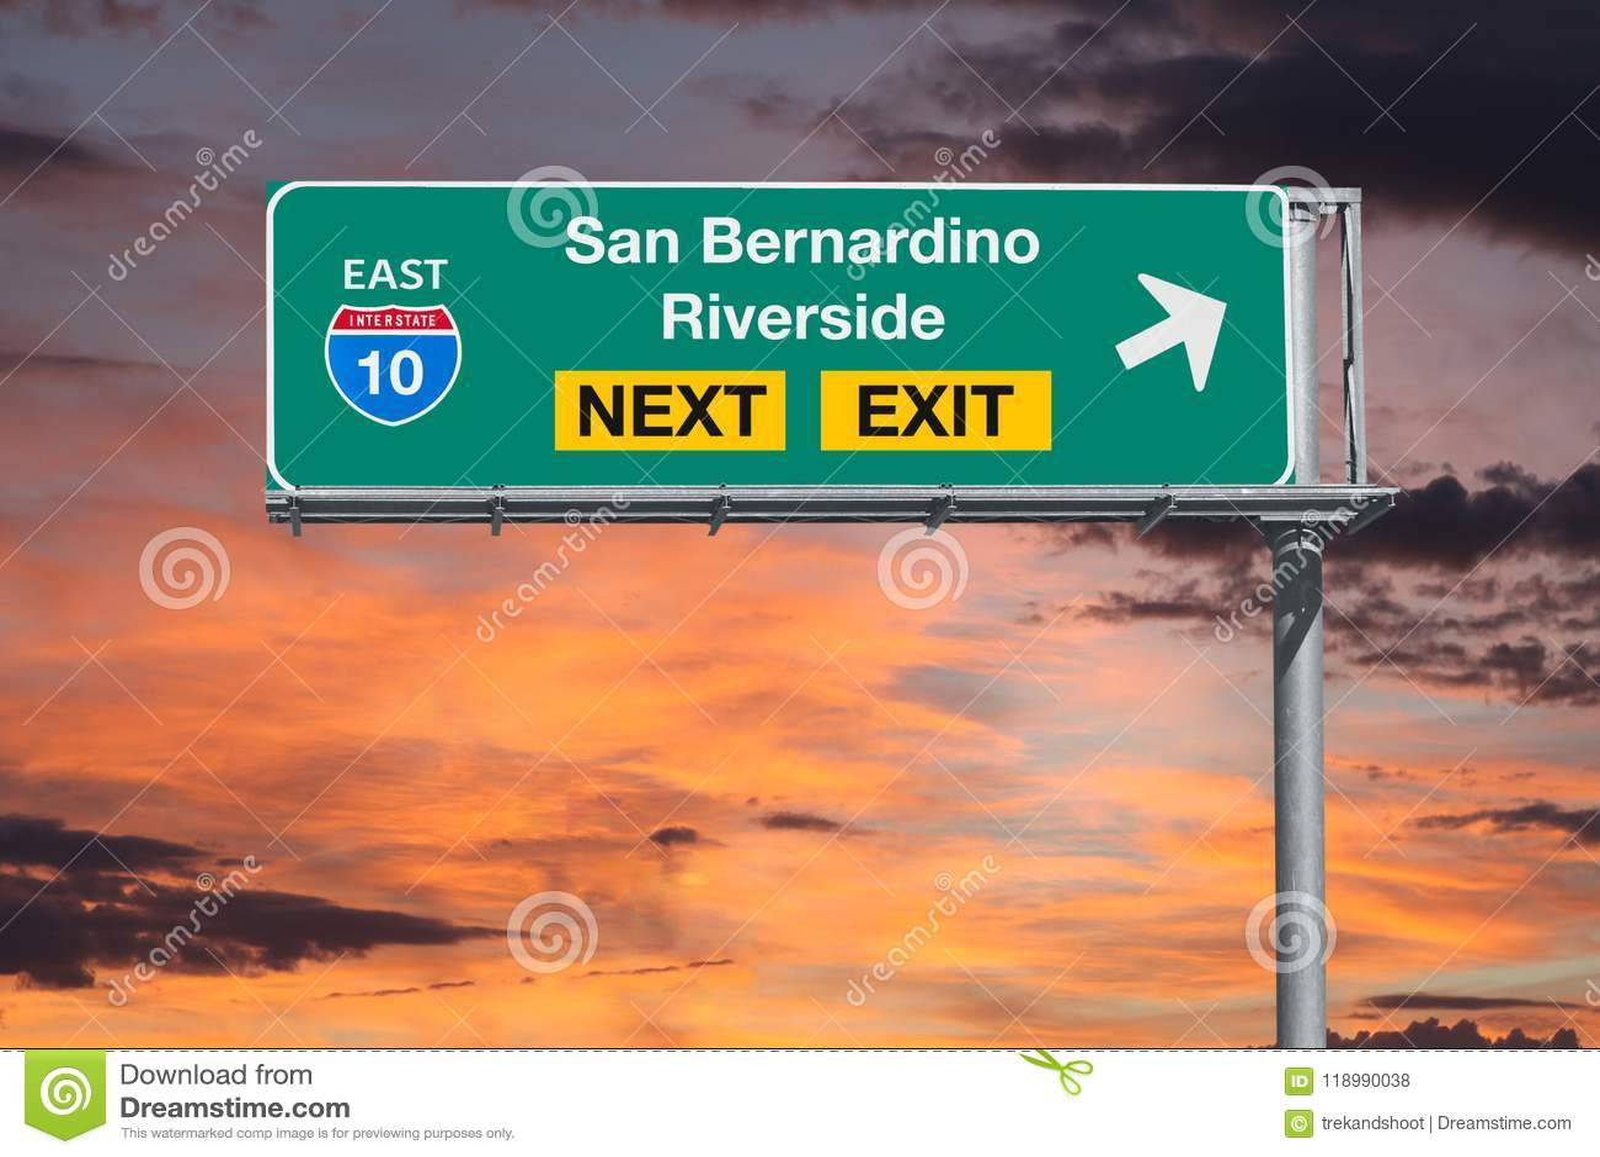 San Bernardino And Riverside California Route 10 Freeway